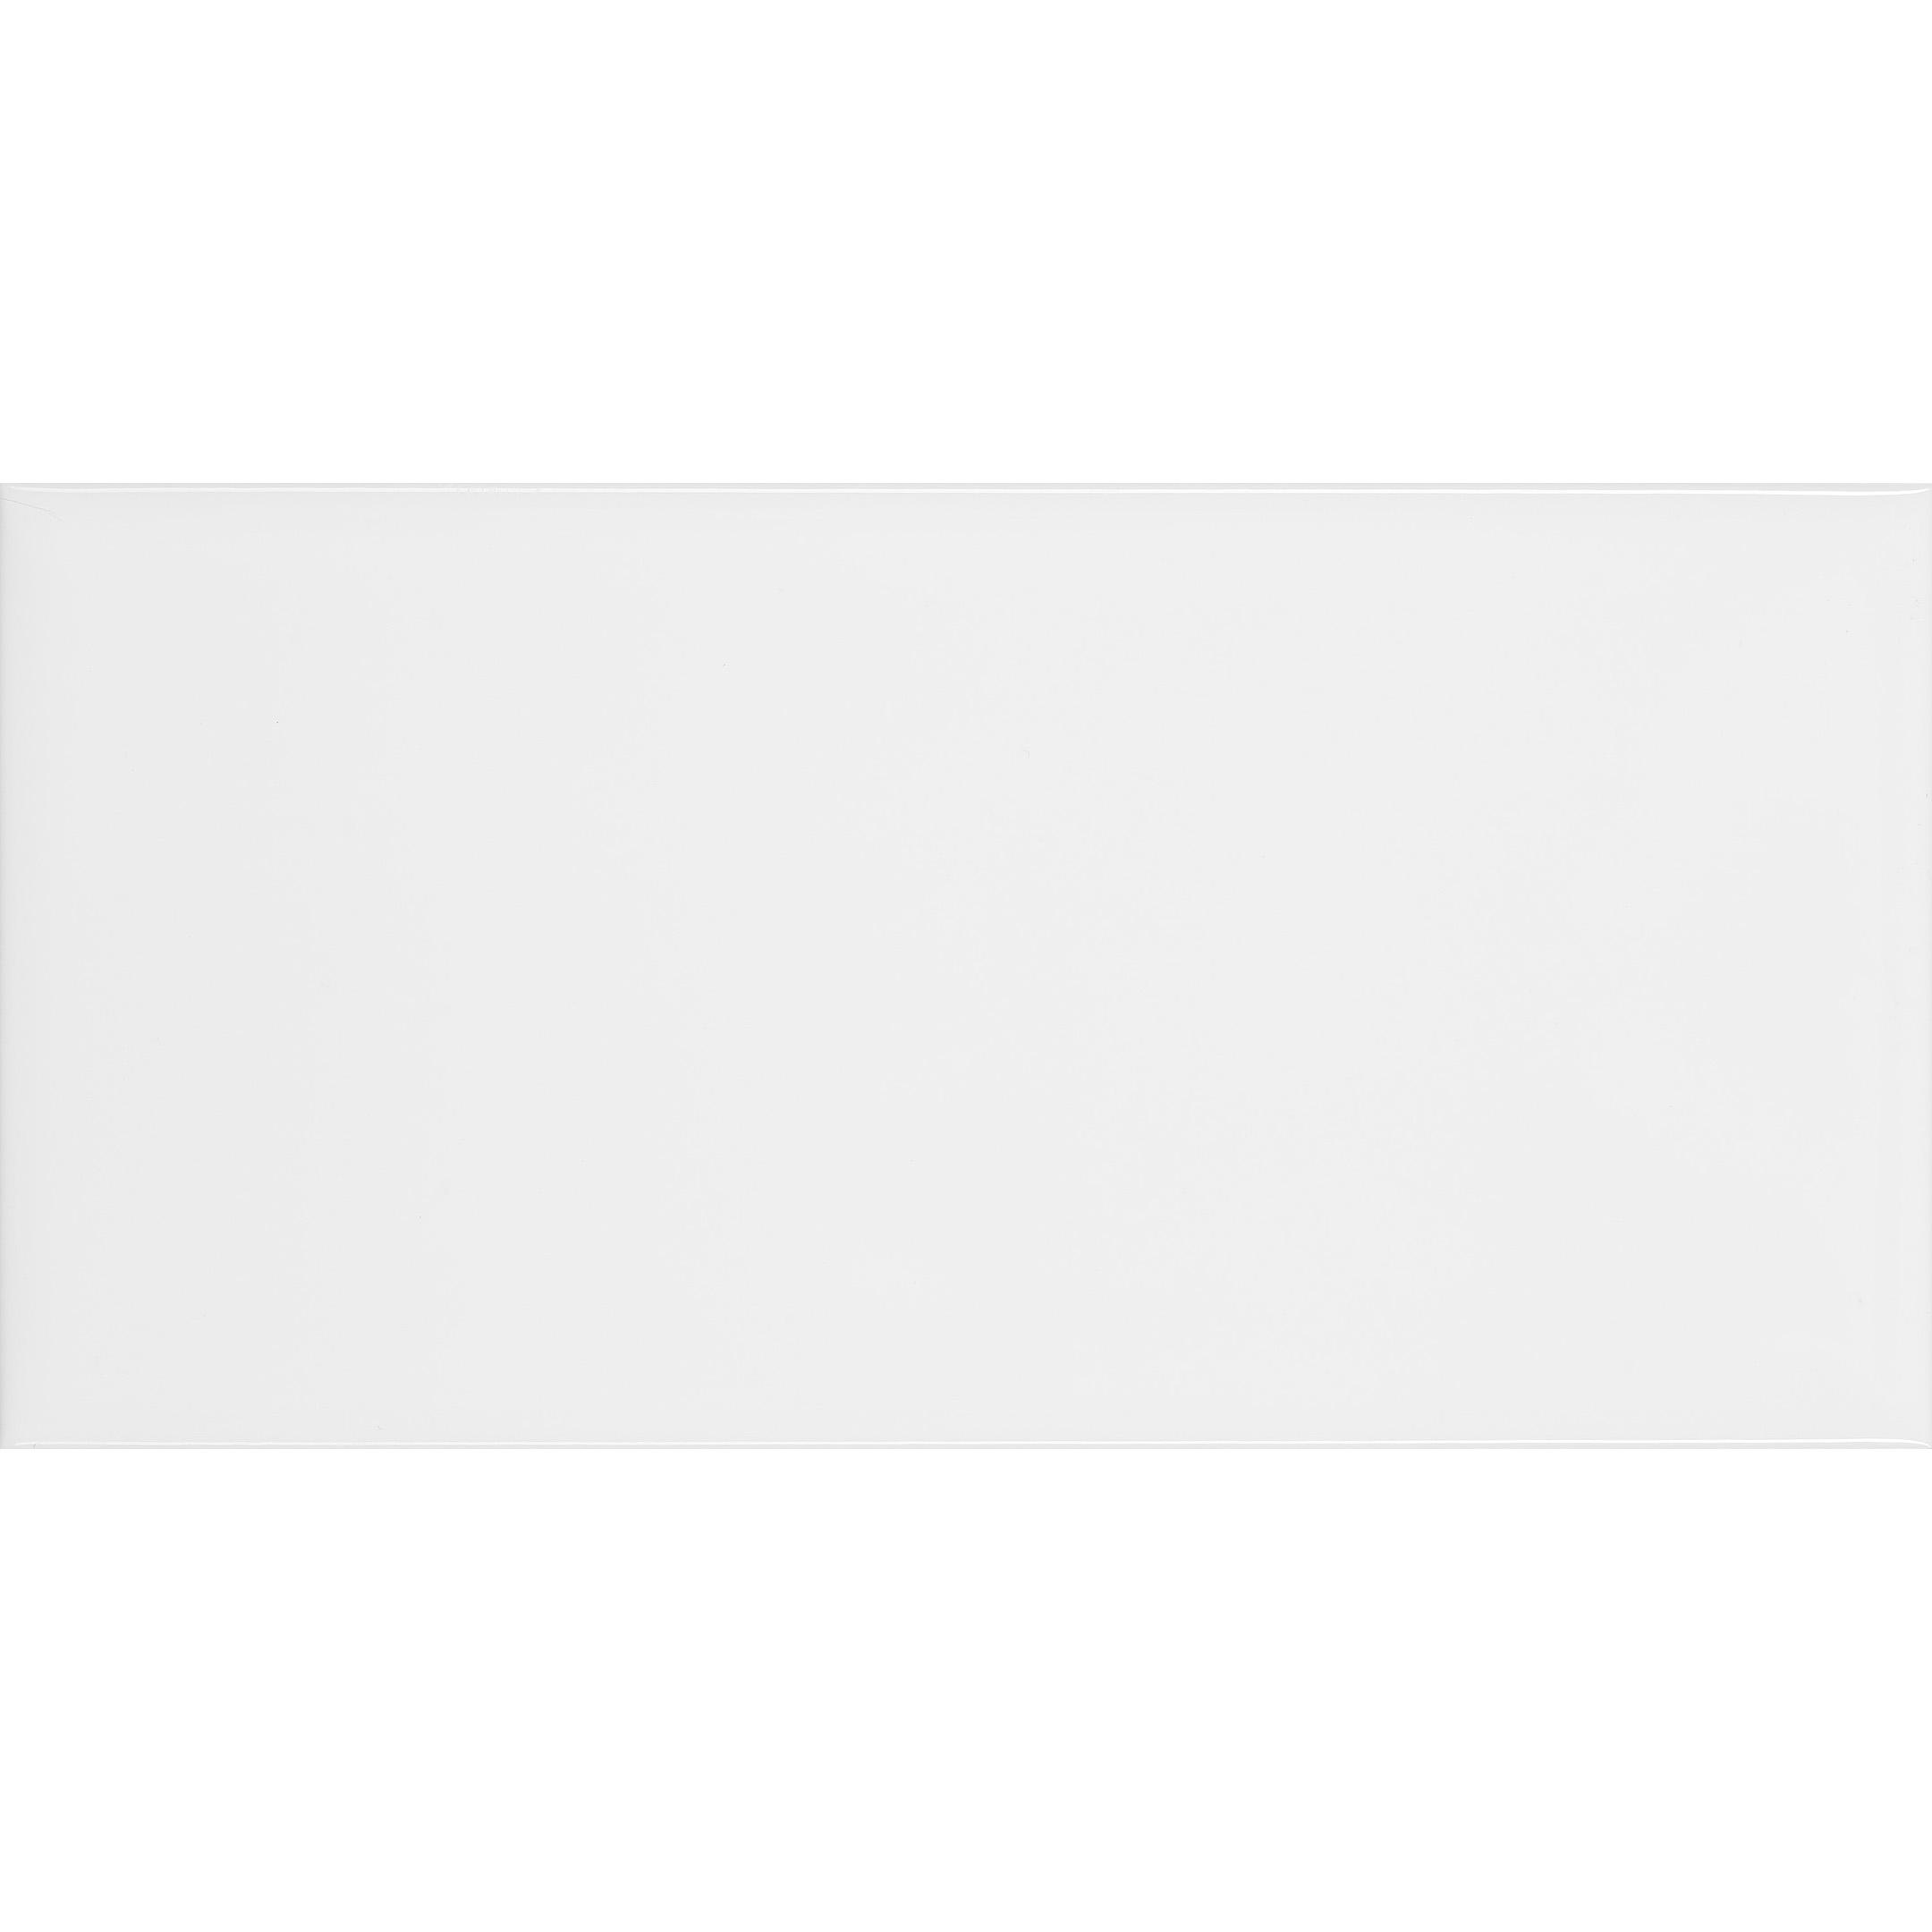 Плитка облицовочная Corsa Deco Plain Brick white 75x150x7 мм (136 шт.=1,53 кв.м)